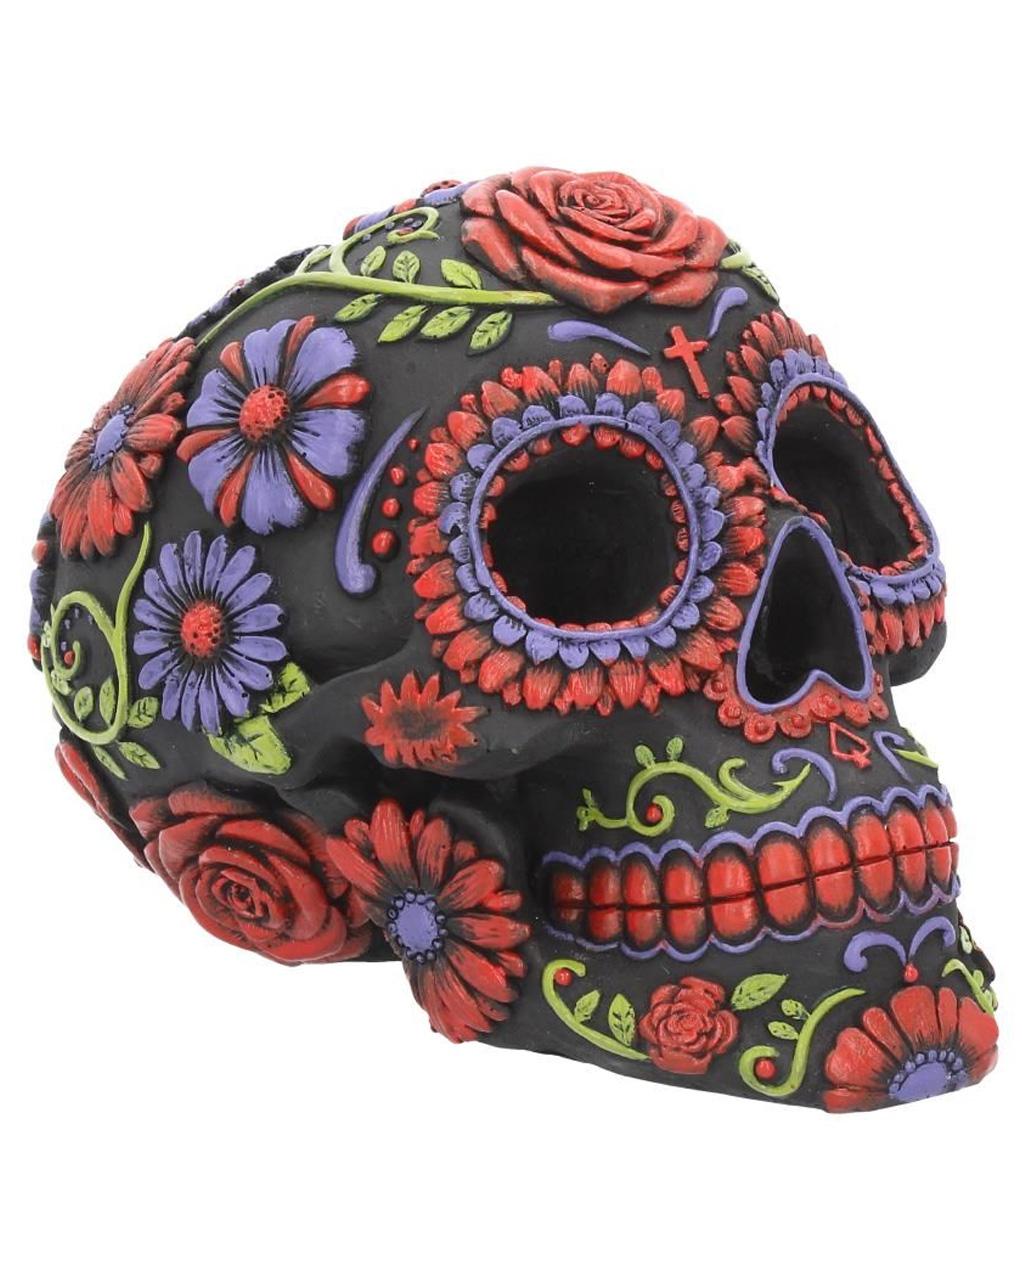 Sculpture Halloween Day of the Dead Decor Ornament Gothic Biker Zebra Print Decorative Skull